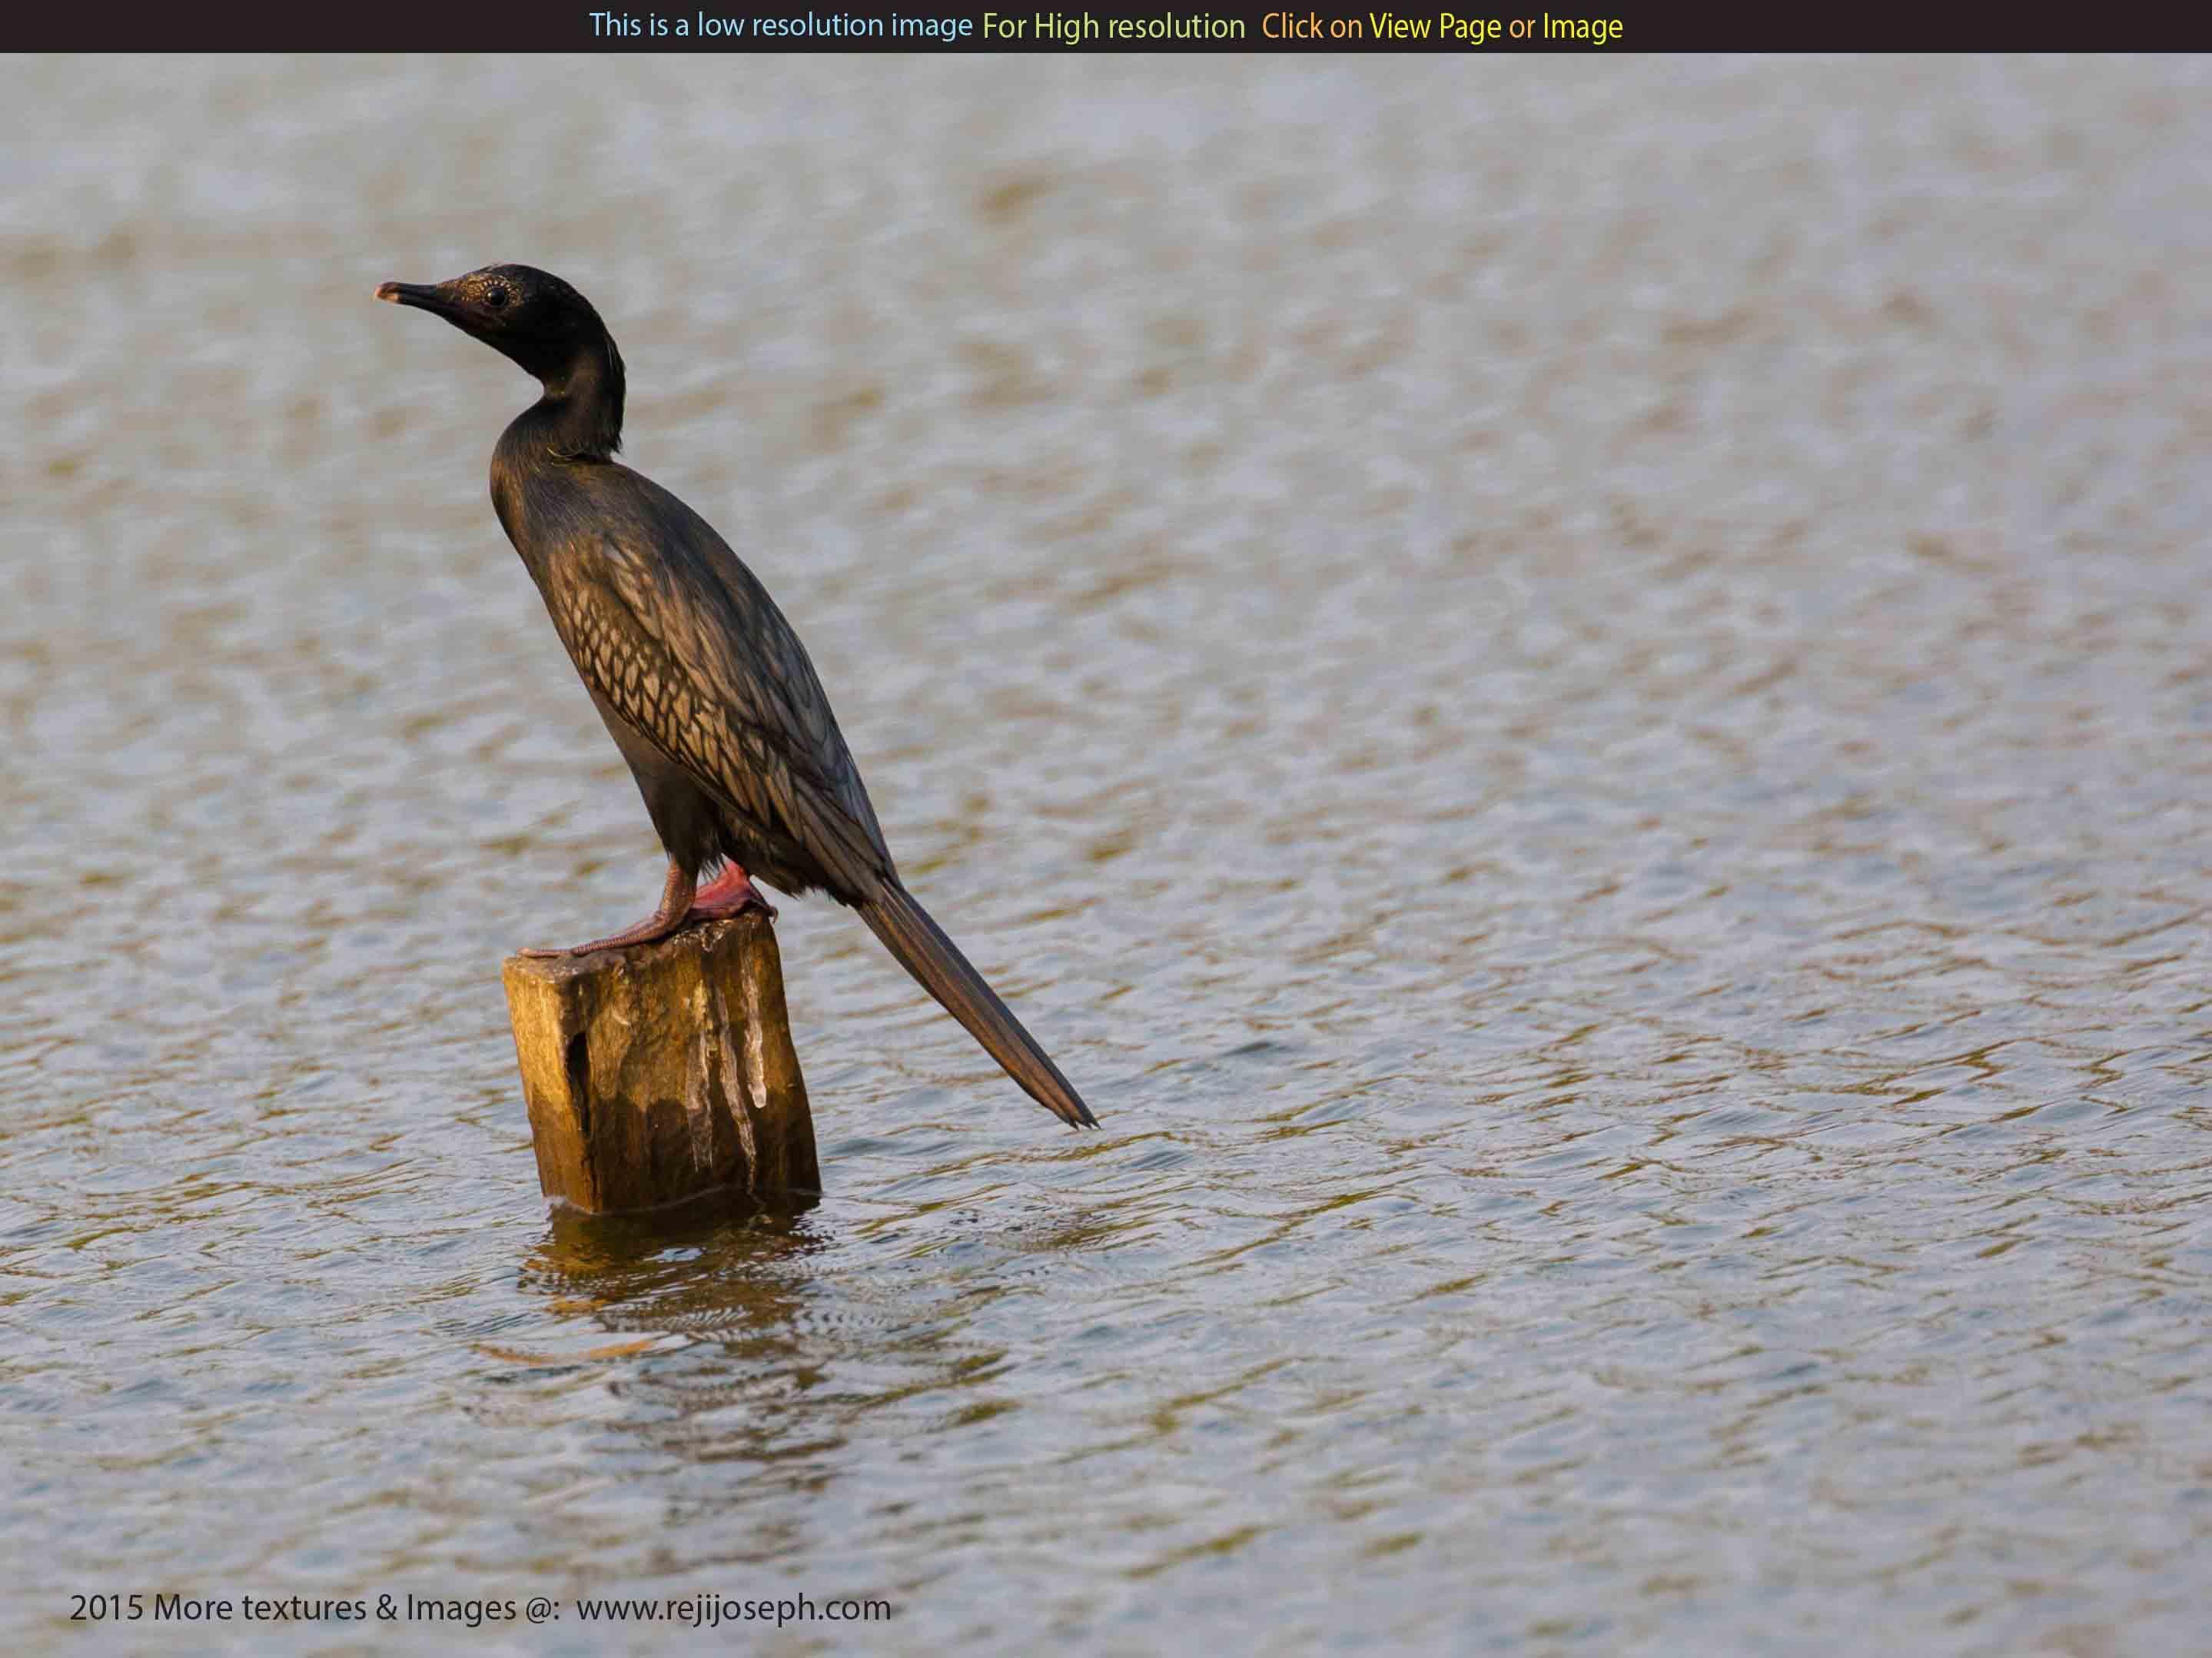 Cormorant bird 00001